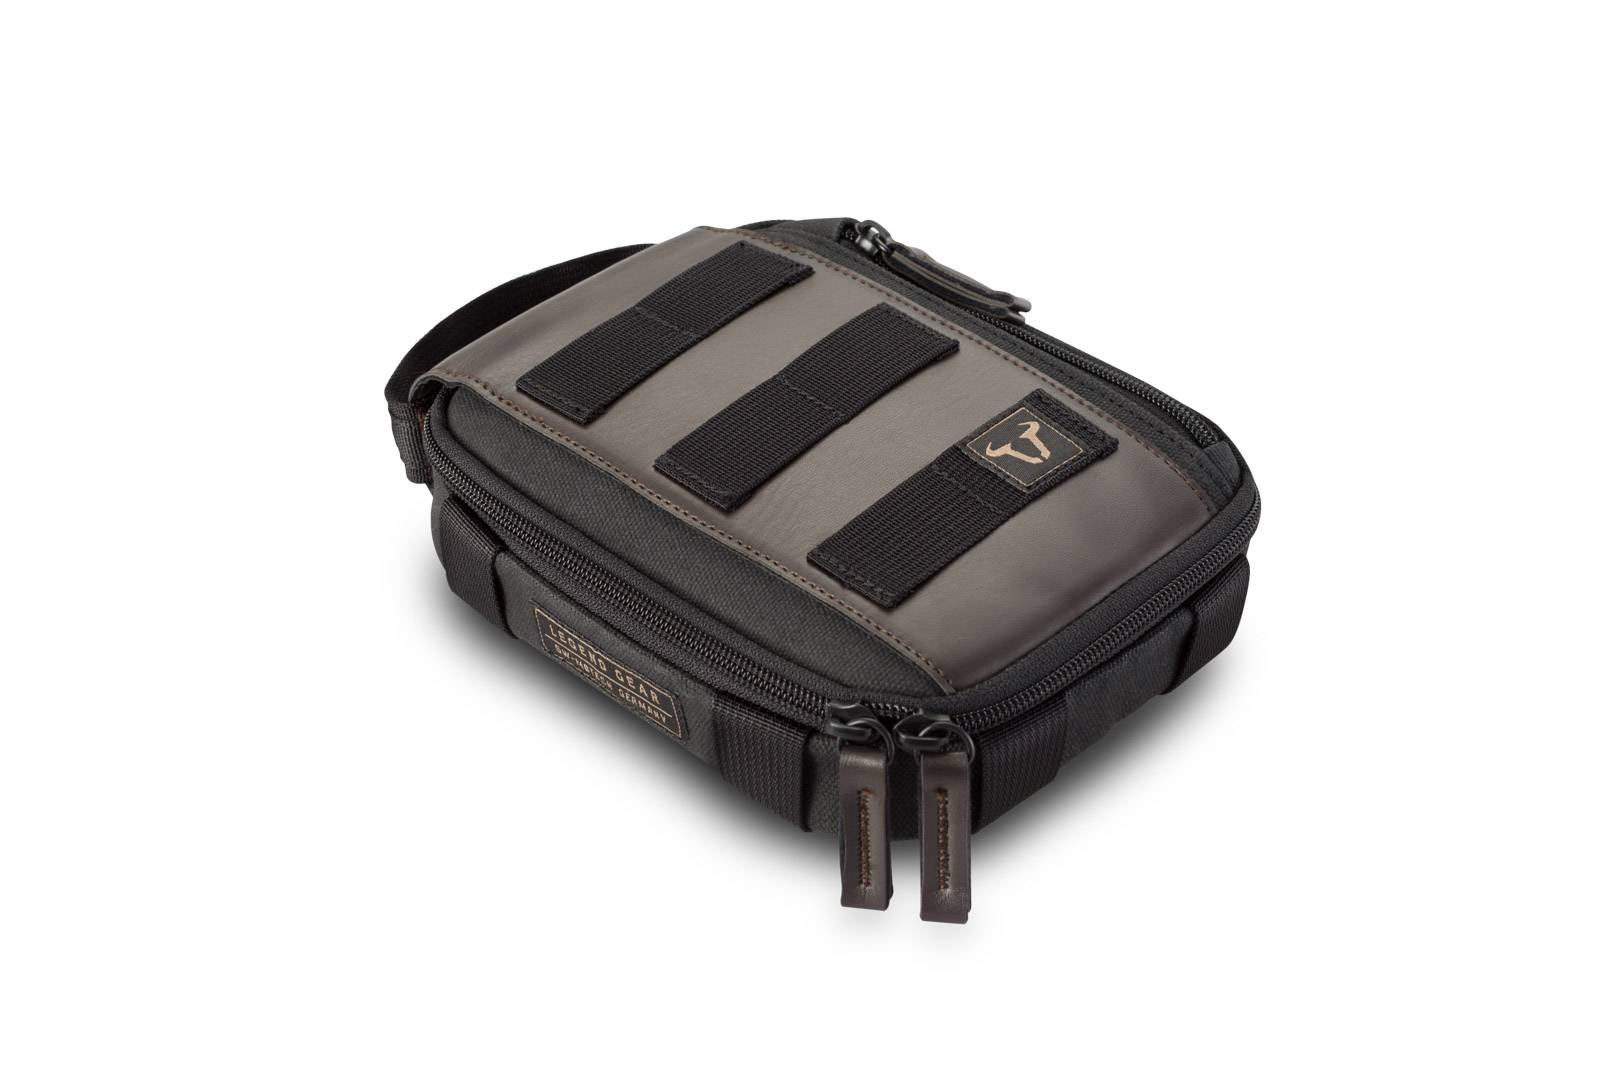 SW-Motech Legend Gear accessory bag LA2 - 1.2 l. Splash-proof. acce...